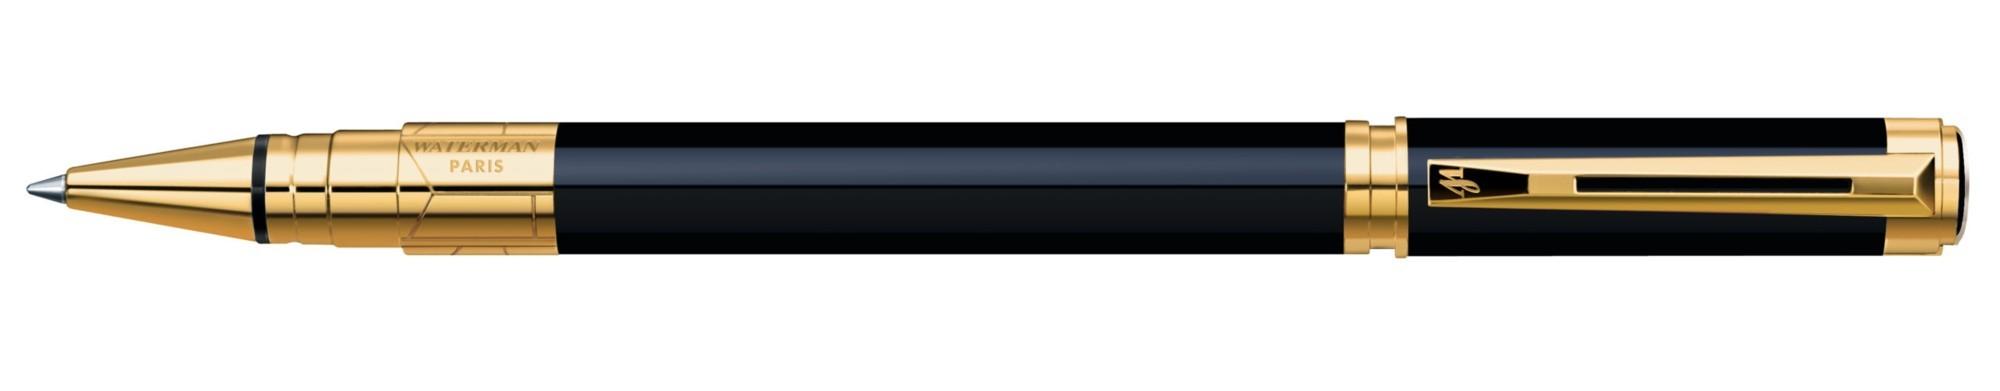 Ручка-роллер Waterman Perspective Black GT